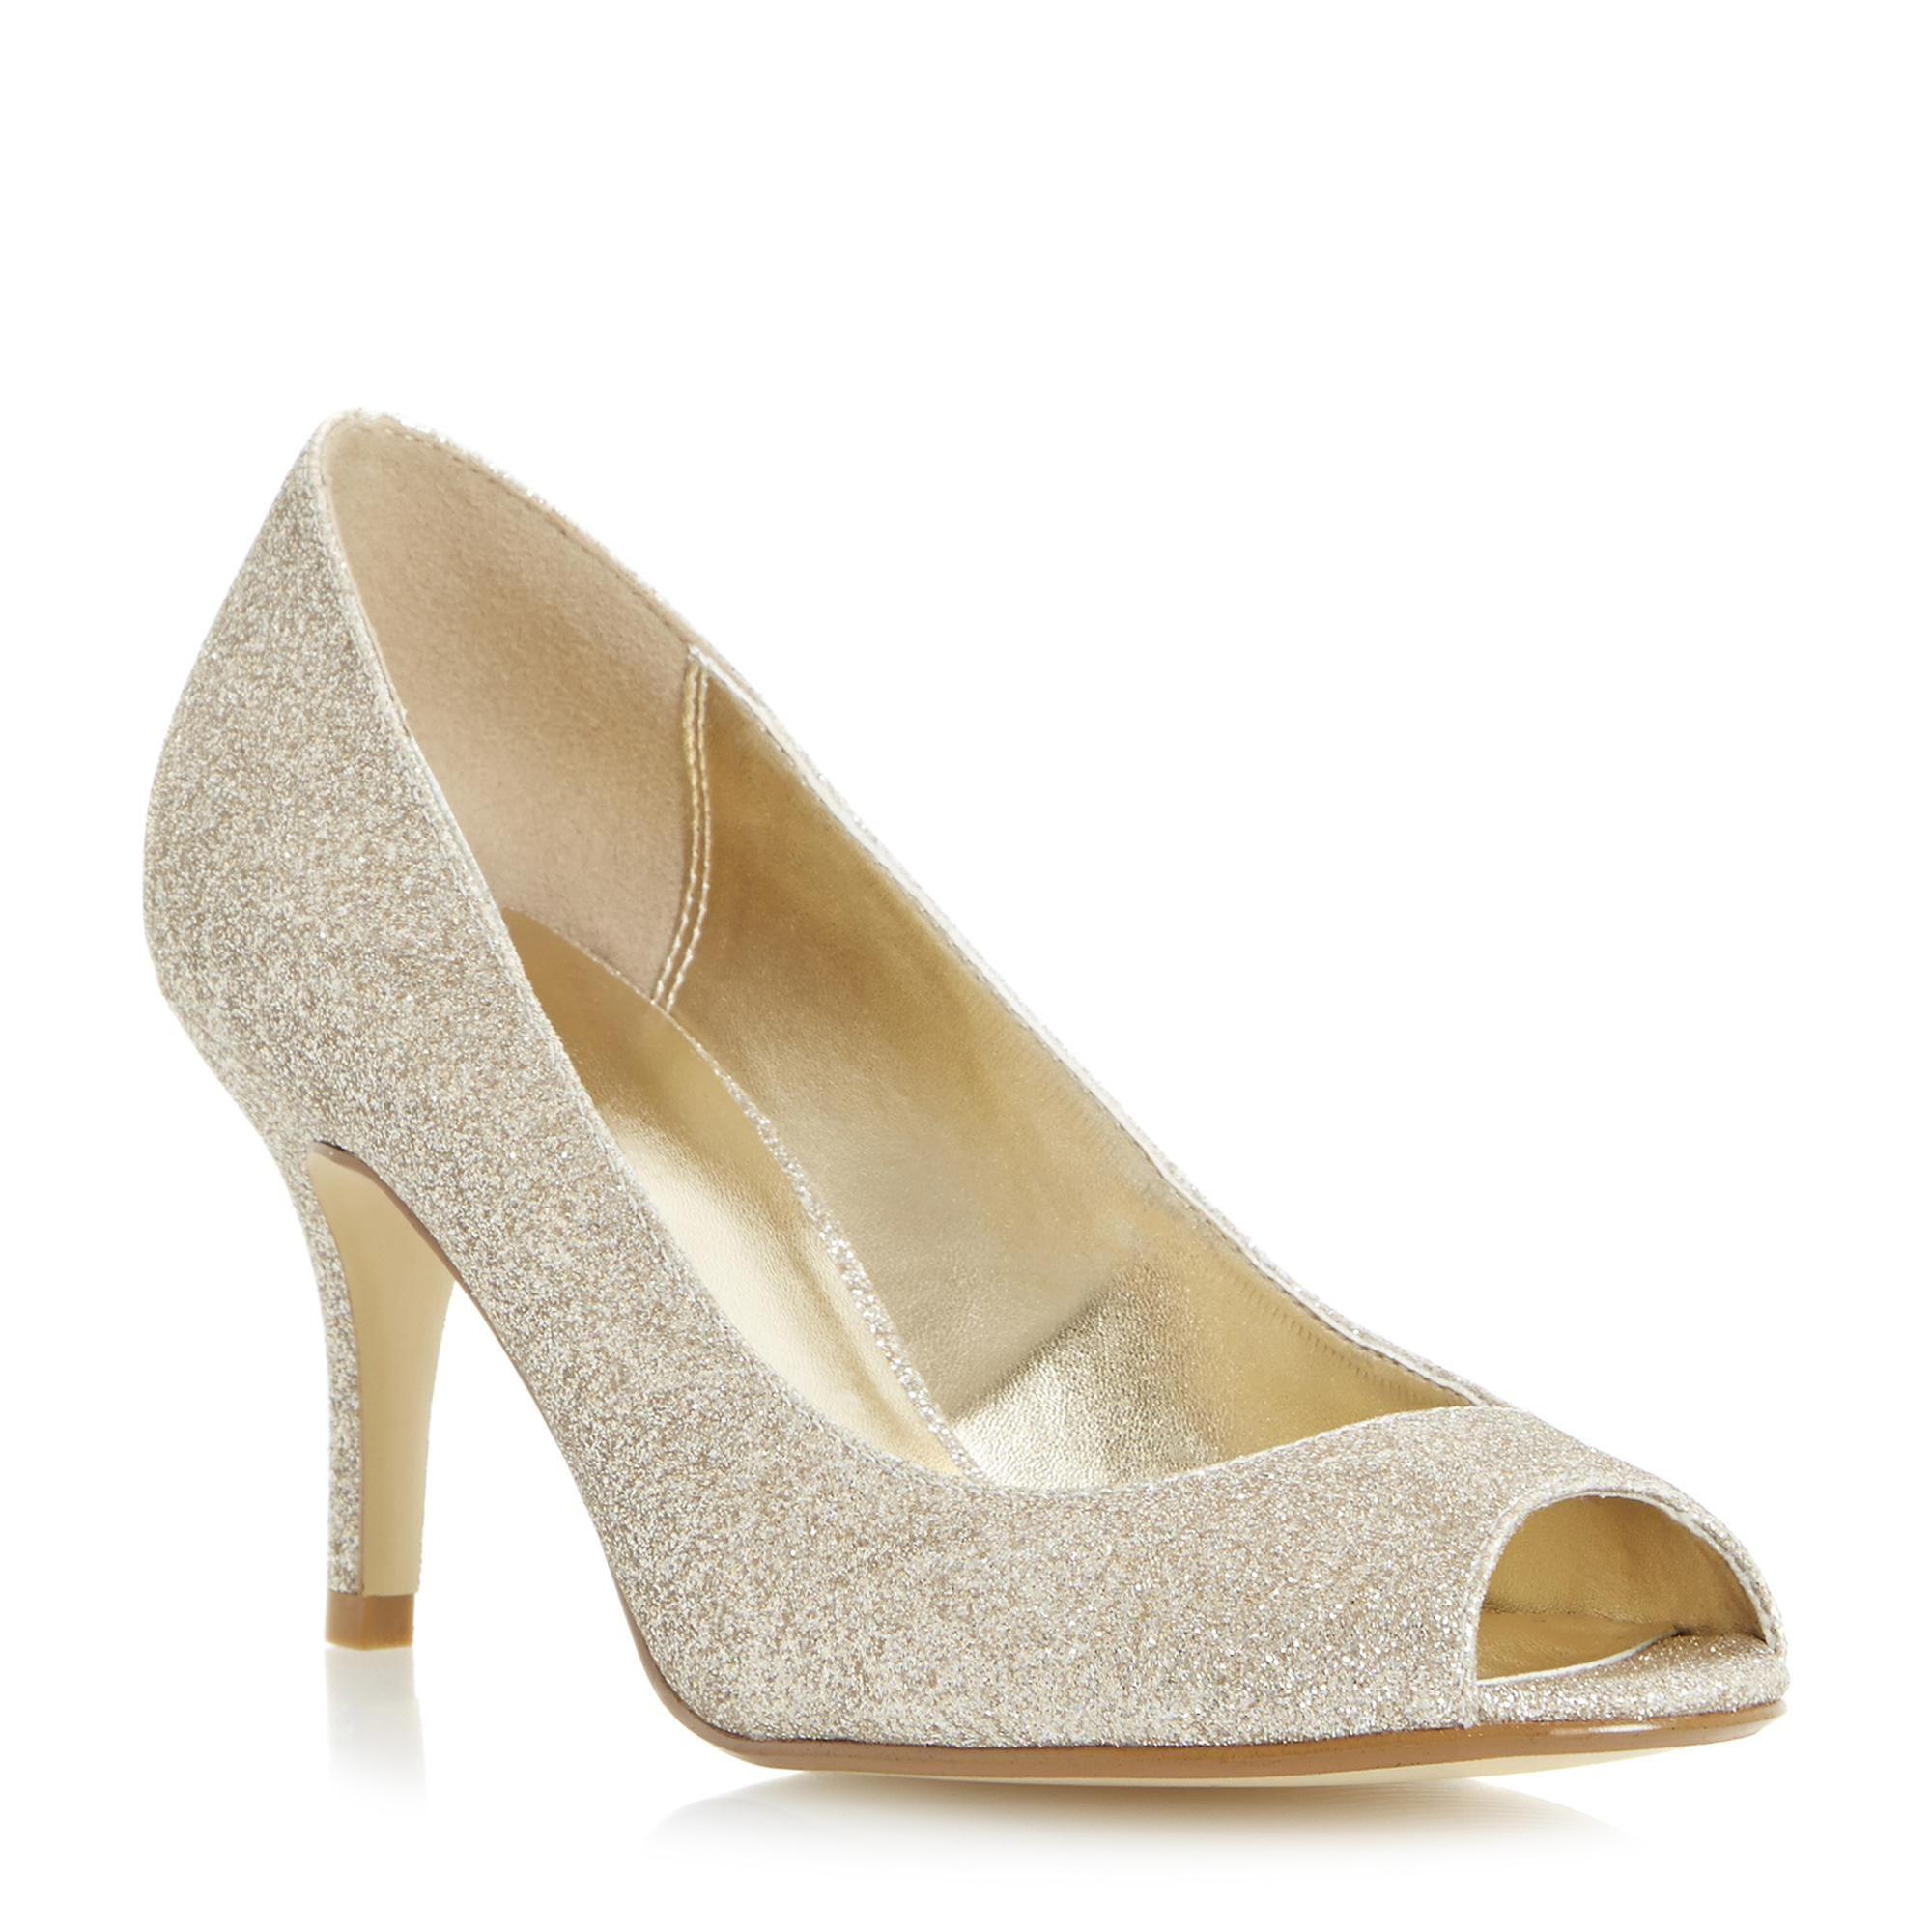 Debenhams Ladies Metallic Shoes